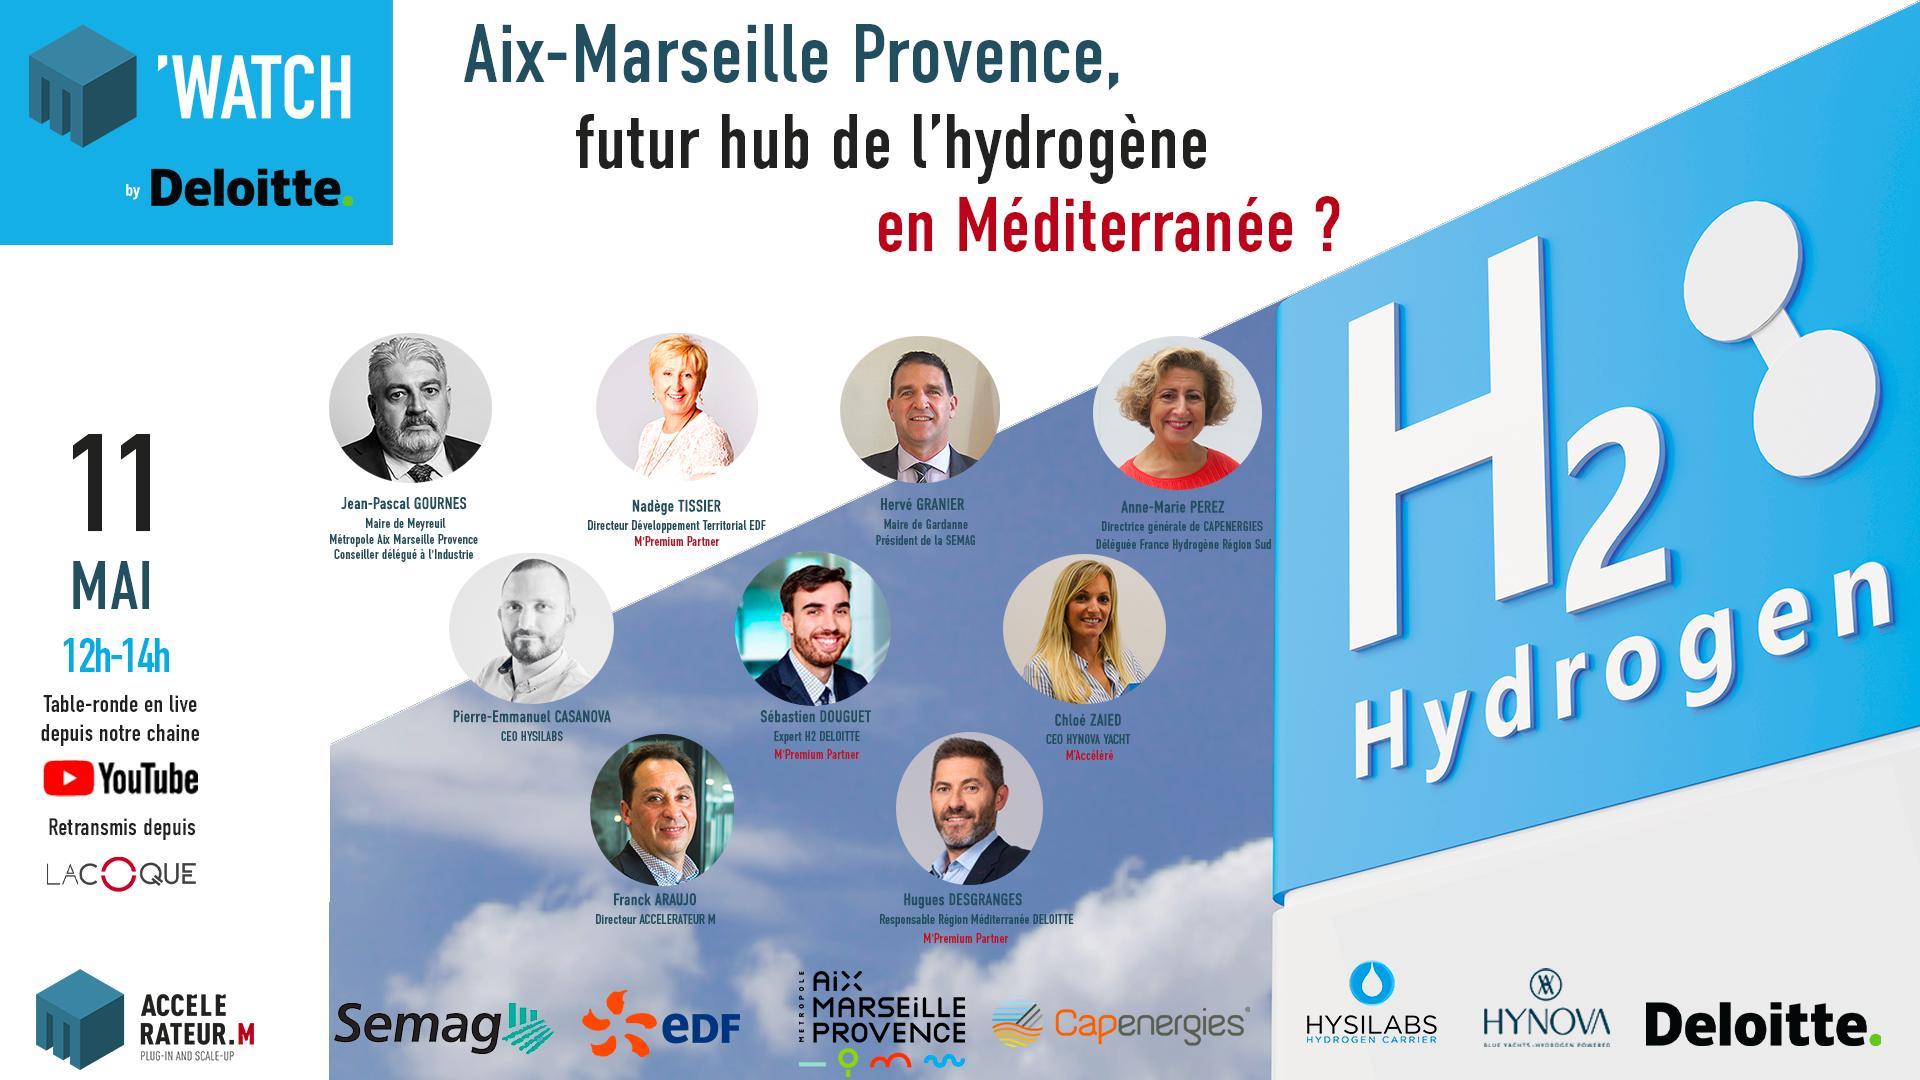 M' Watch : Aix-Marseille futur hub de l'hydrogène en Méditerranée ?